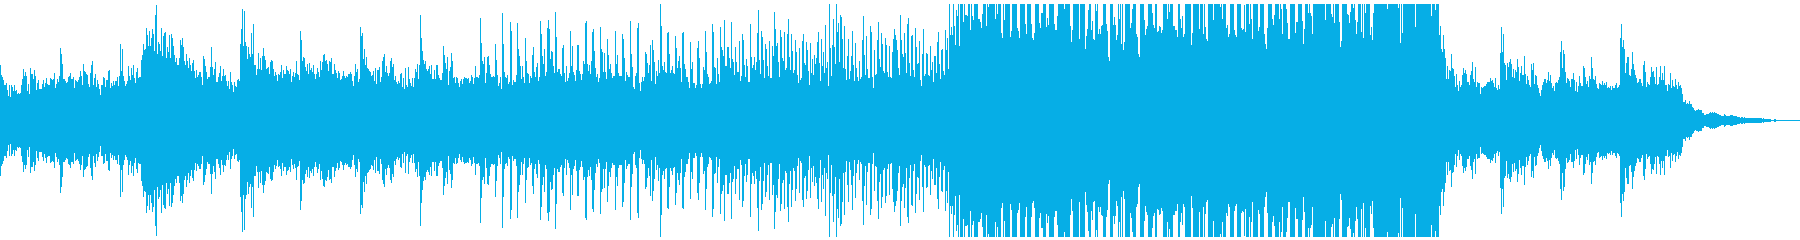 SF感のあるBGMの再生済みの波形